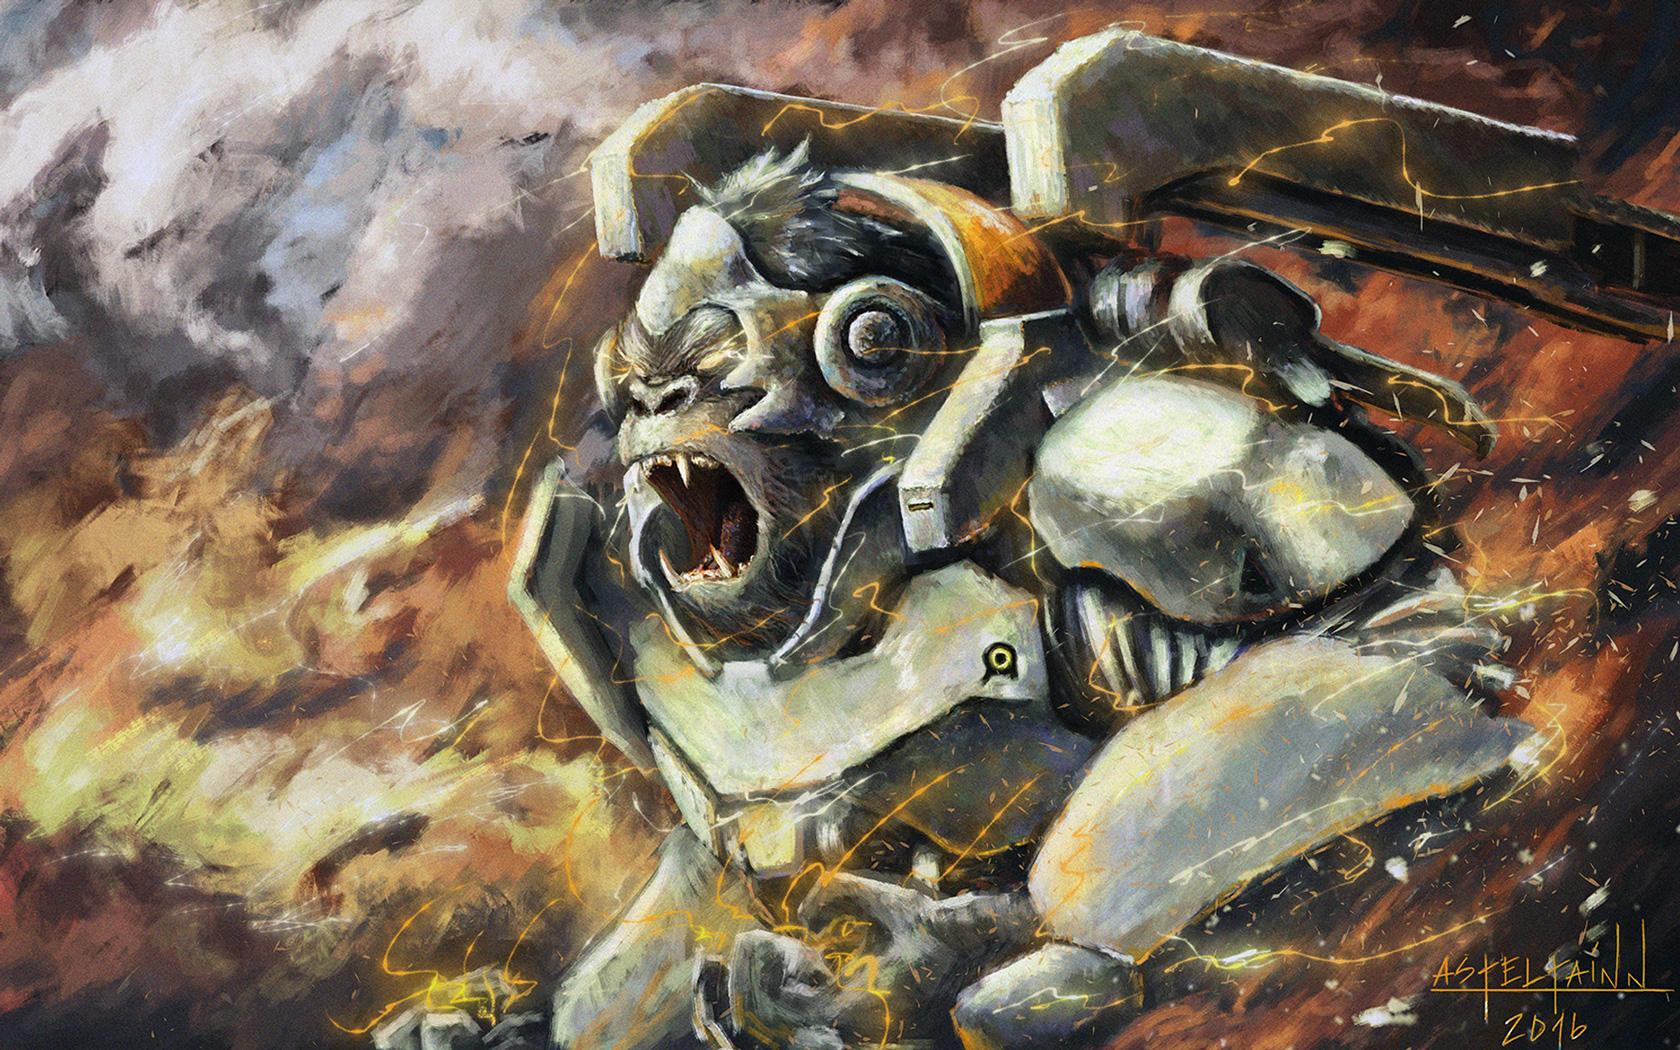 Free Overwatch Wallpaper in 1680x1050